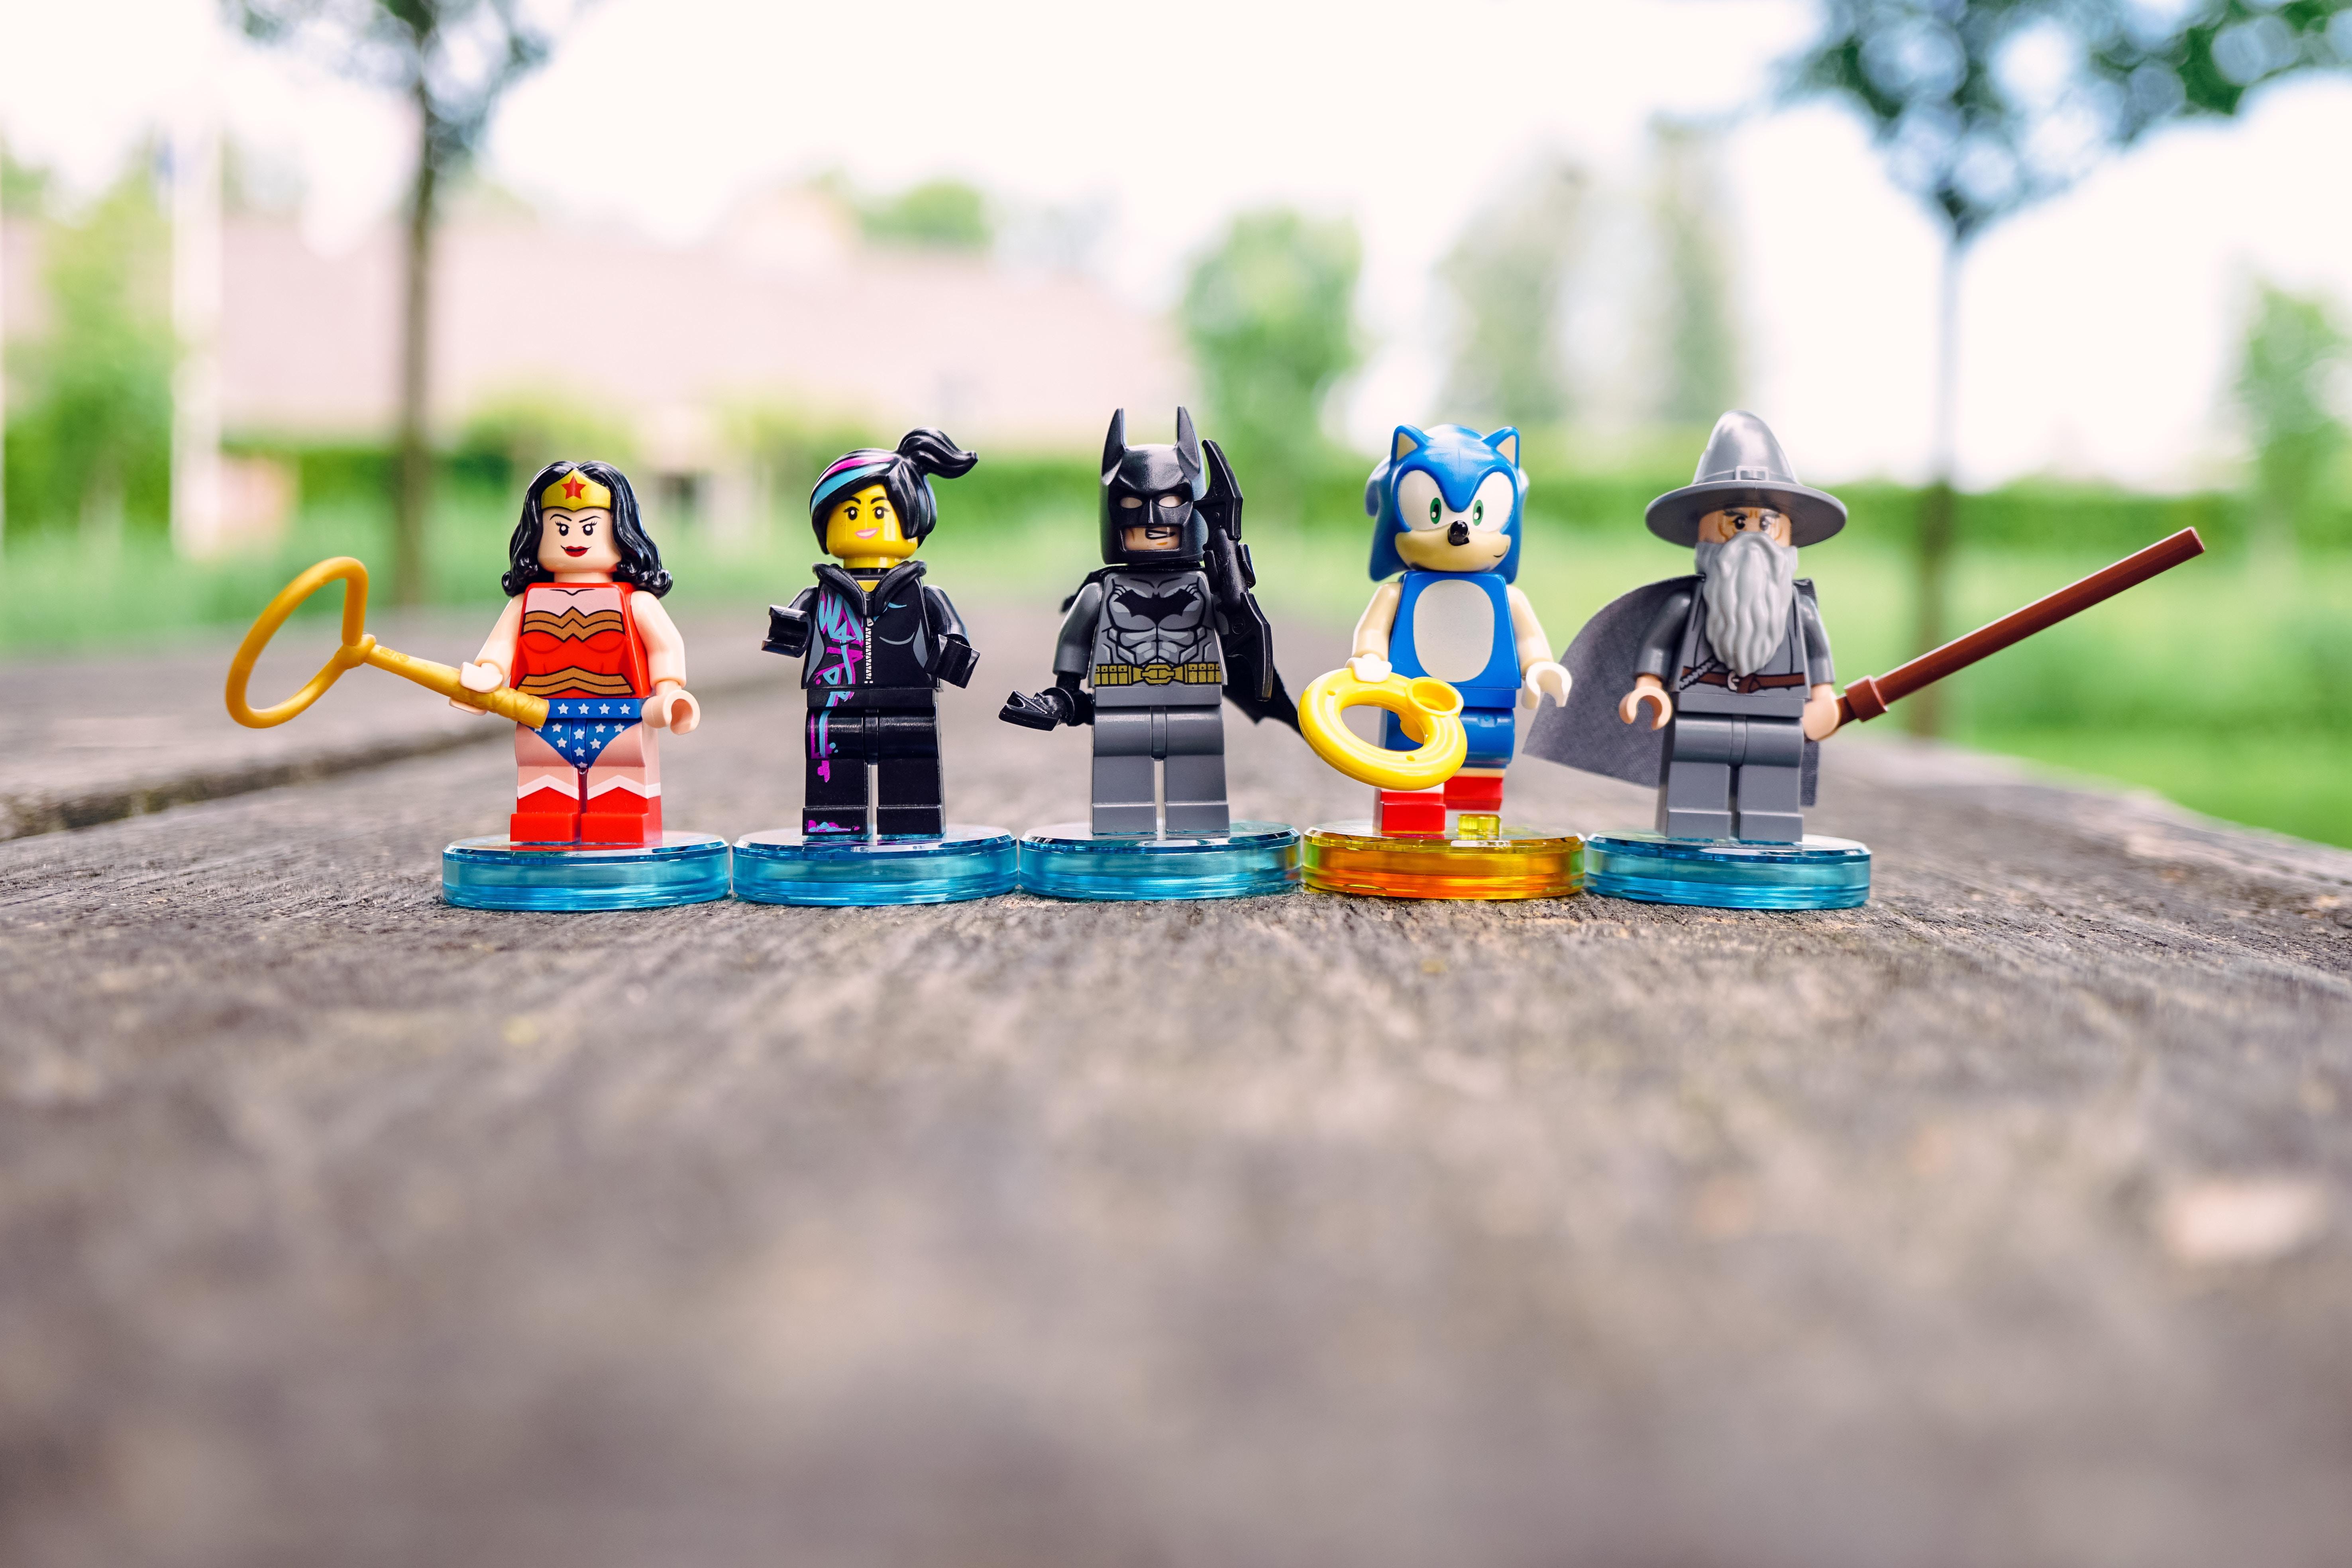 LEGO Batman, Wonder Woman, Sonic Hedgehog, and Harry Potter Gandalf toys